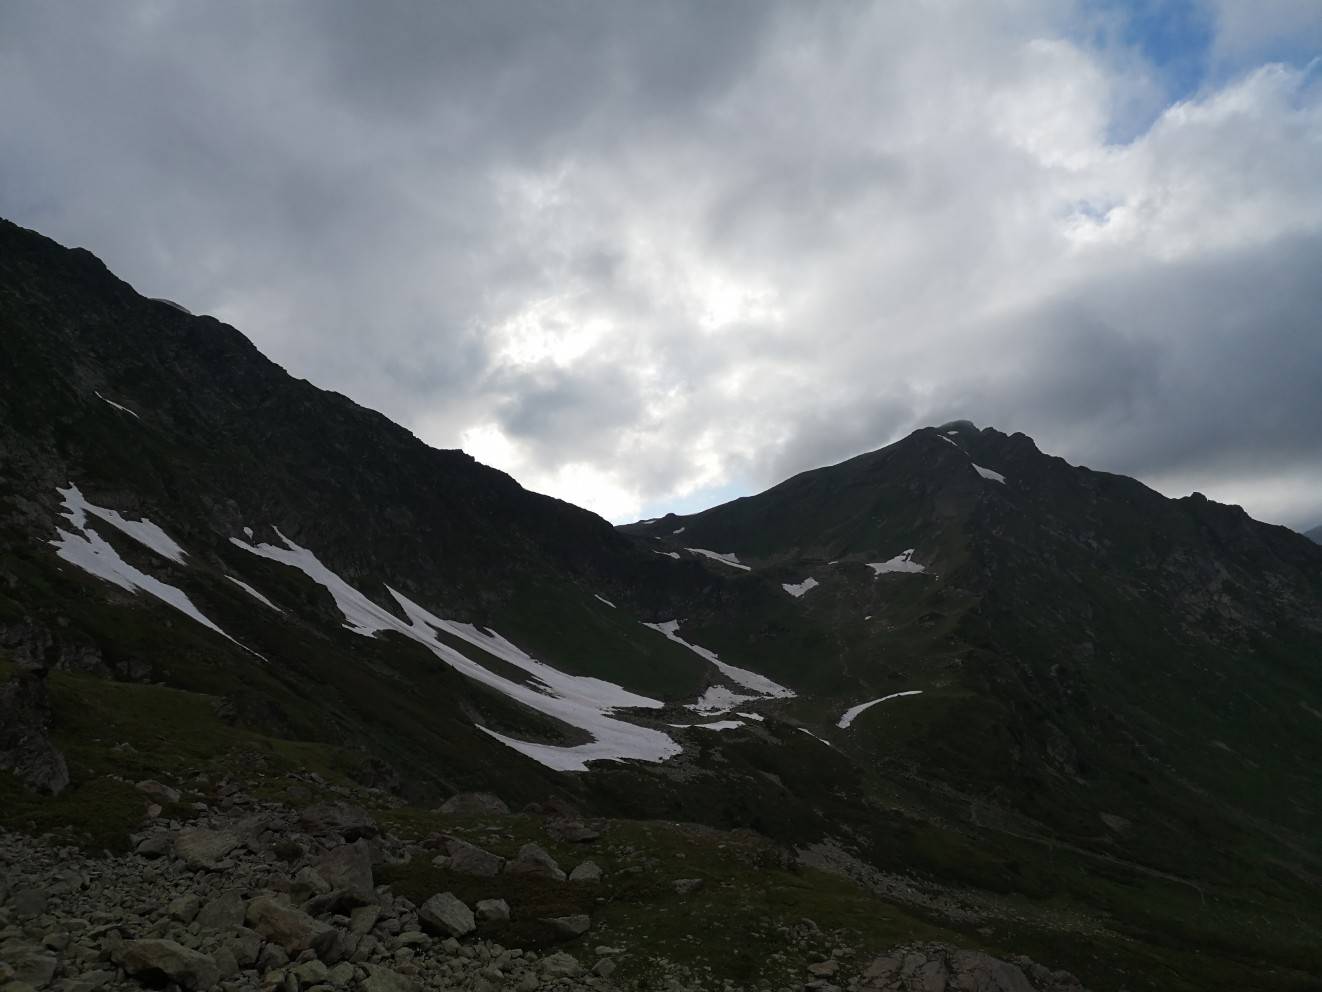 ТрансКавказ-2019. Аркасара-Пхия-Мамхурц Краснодарский край,Кавказ